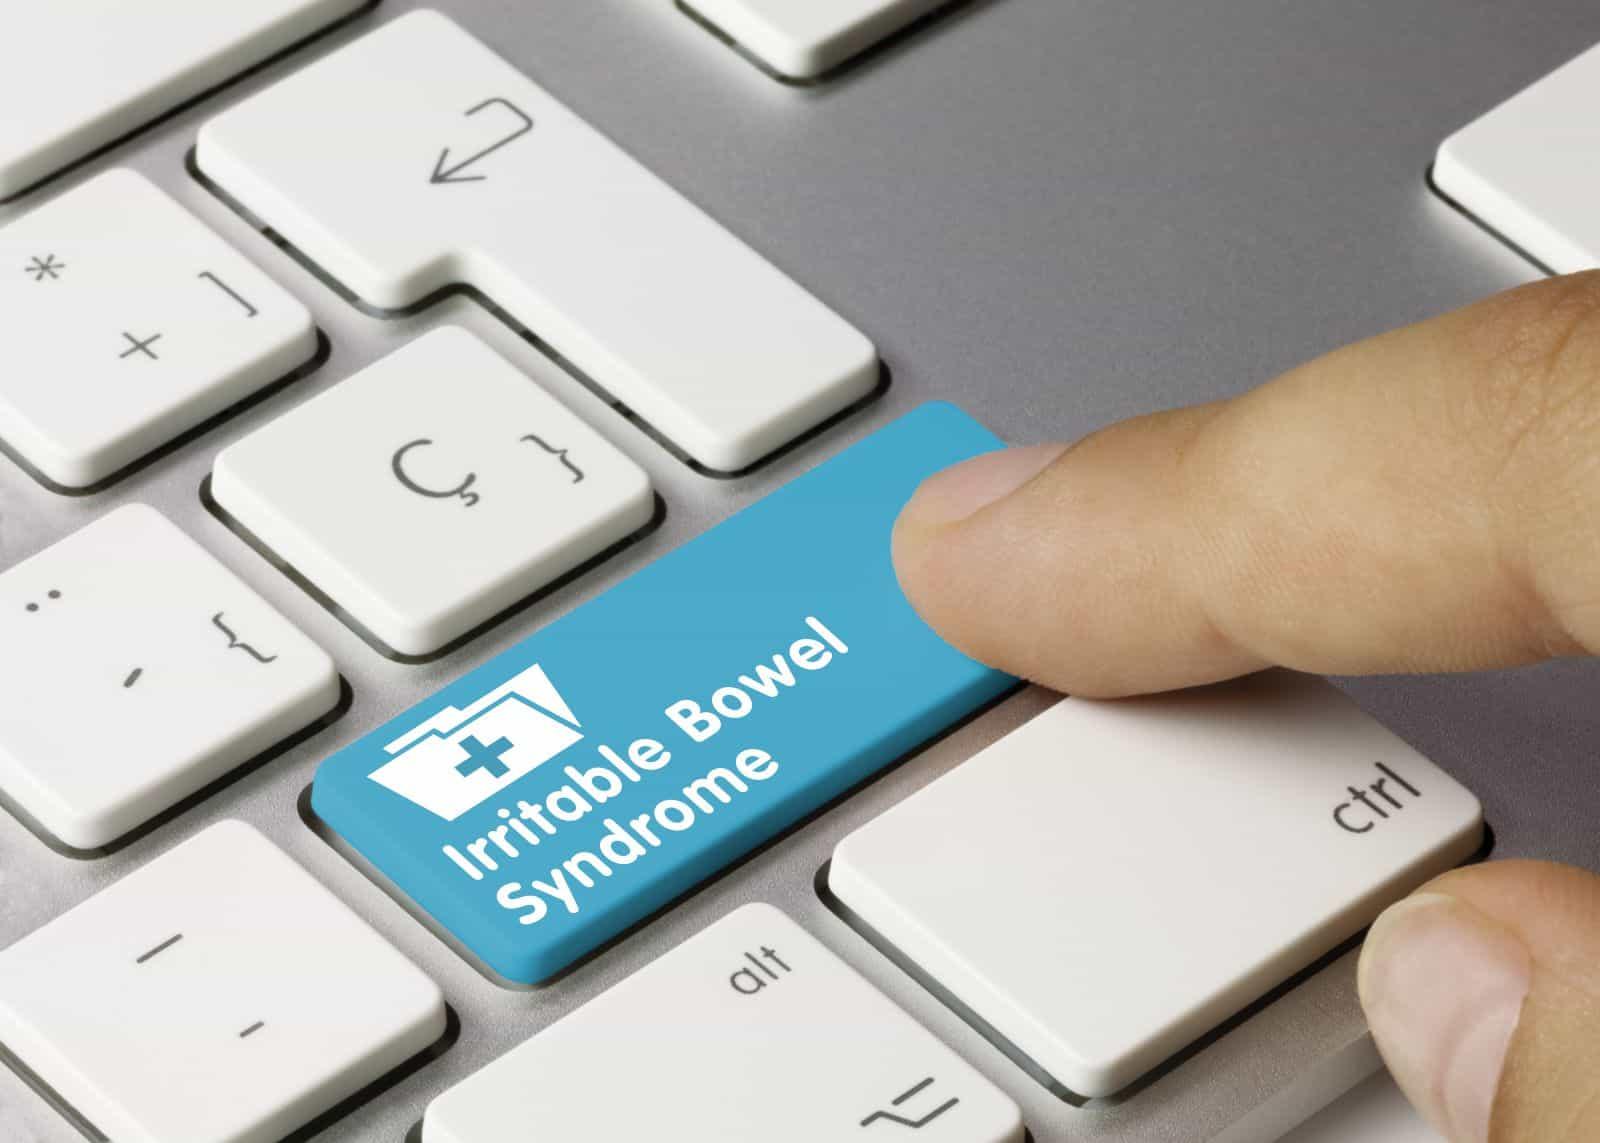 IBS treatment: Finger hitting irritable bowel syndrome key